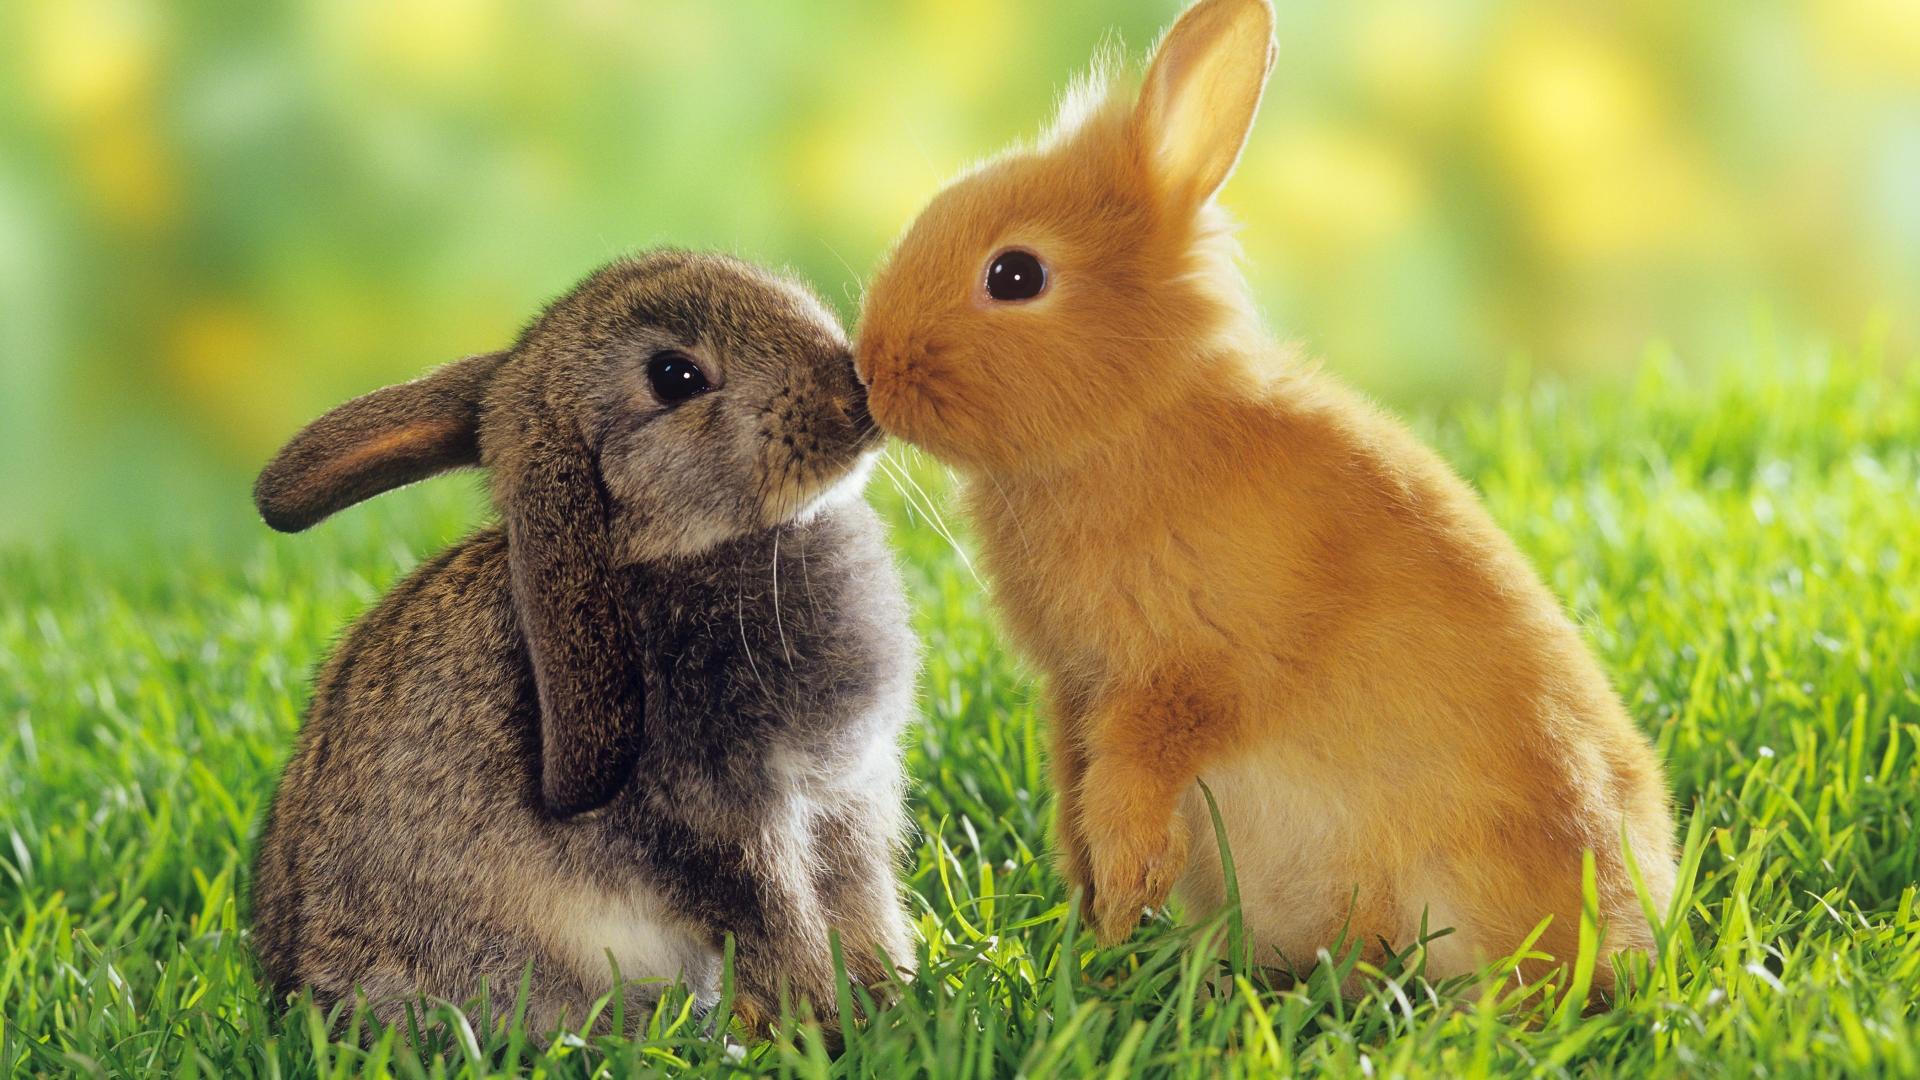 Cute Baby Animal Wallpapers   PixelsTalk Net